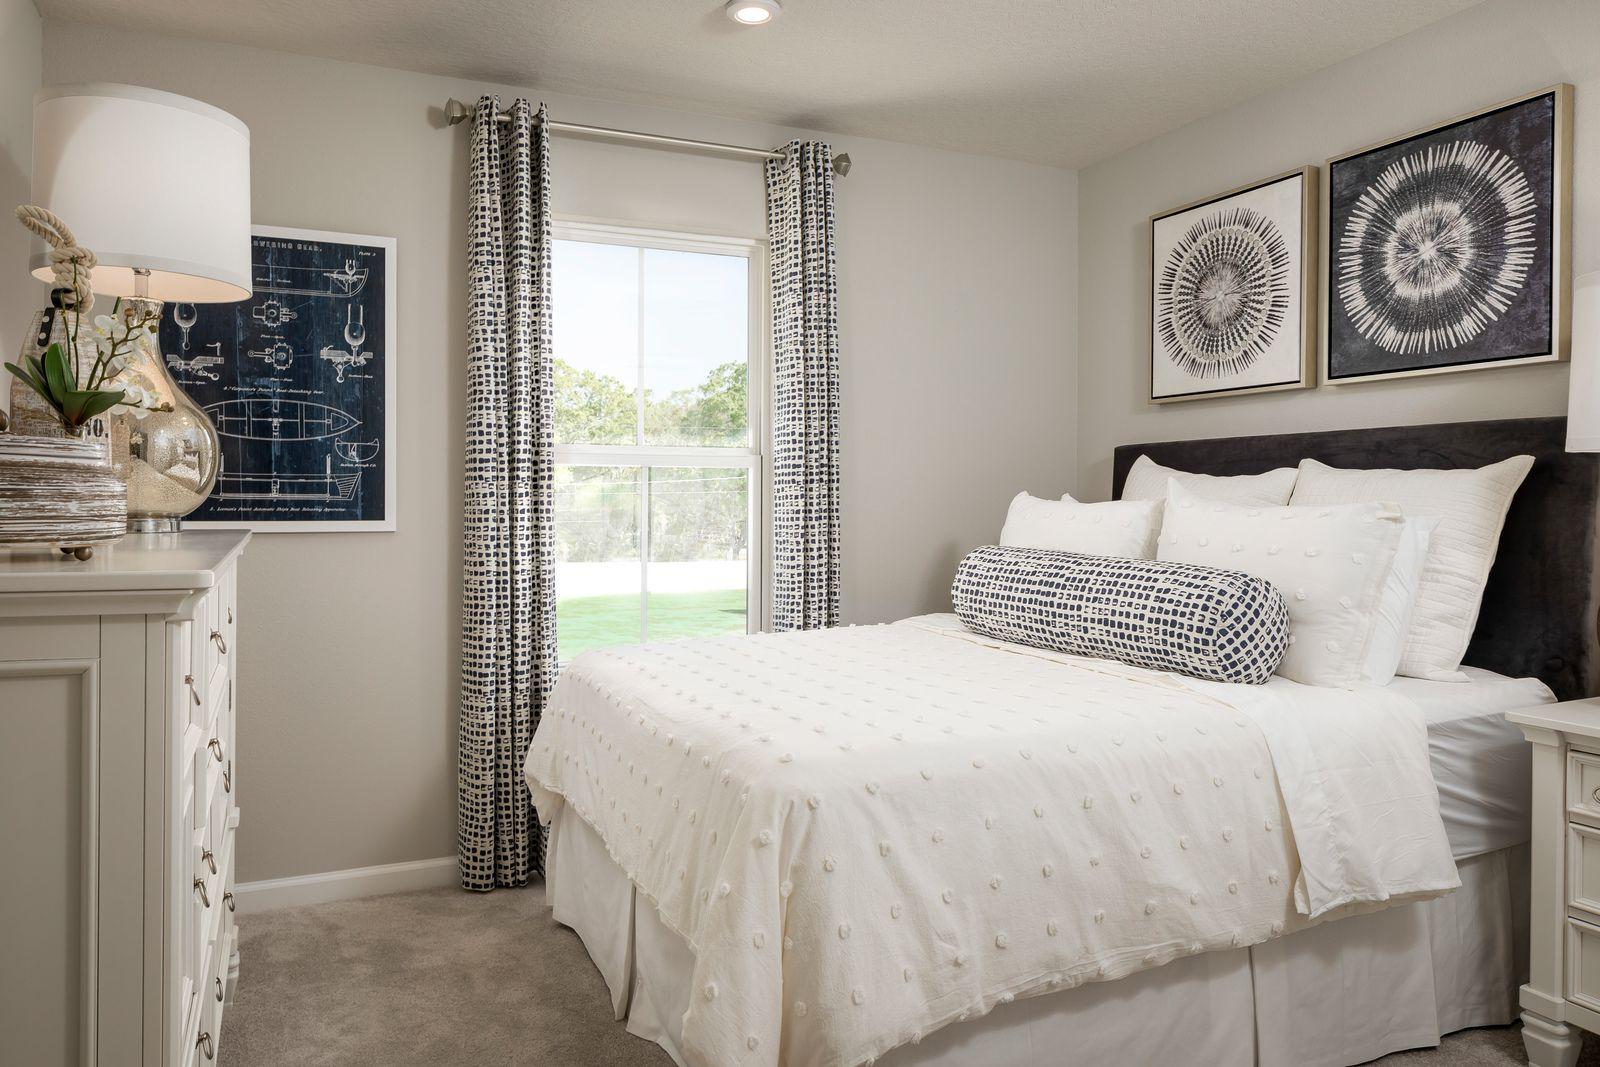 Bedroom featured in the Pelican-Estuary By Ryan Homes in Tampa-St. Petersburg, FL